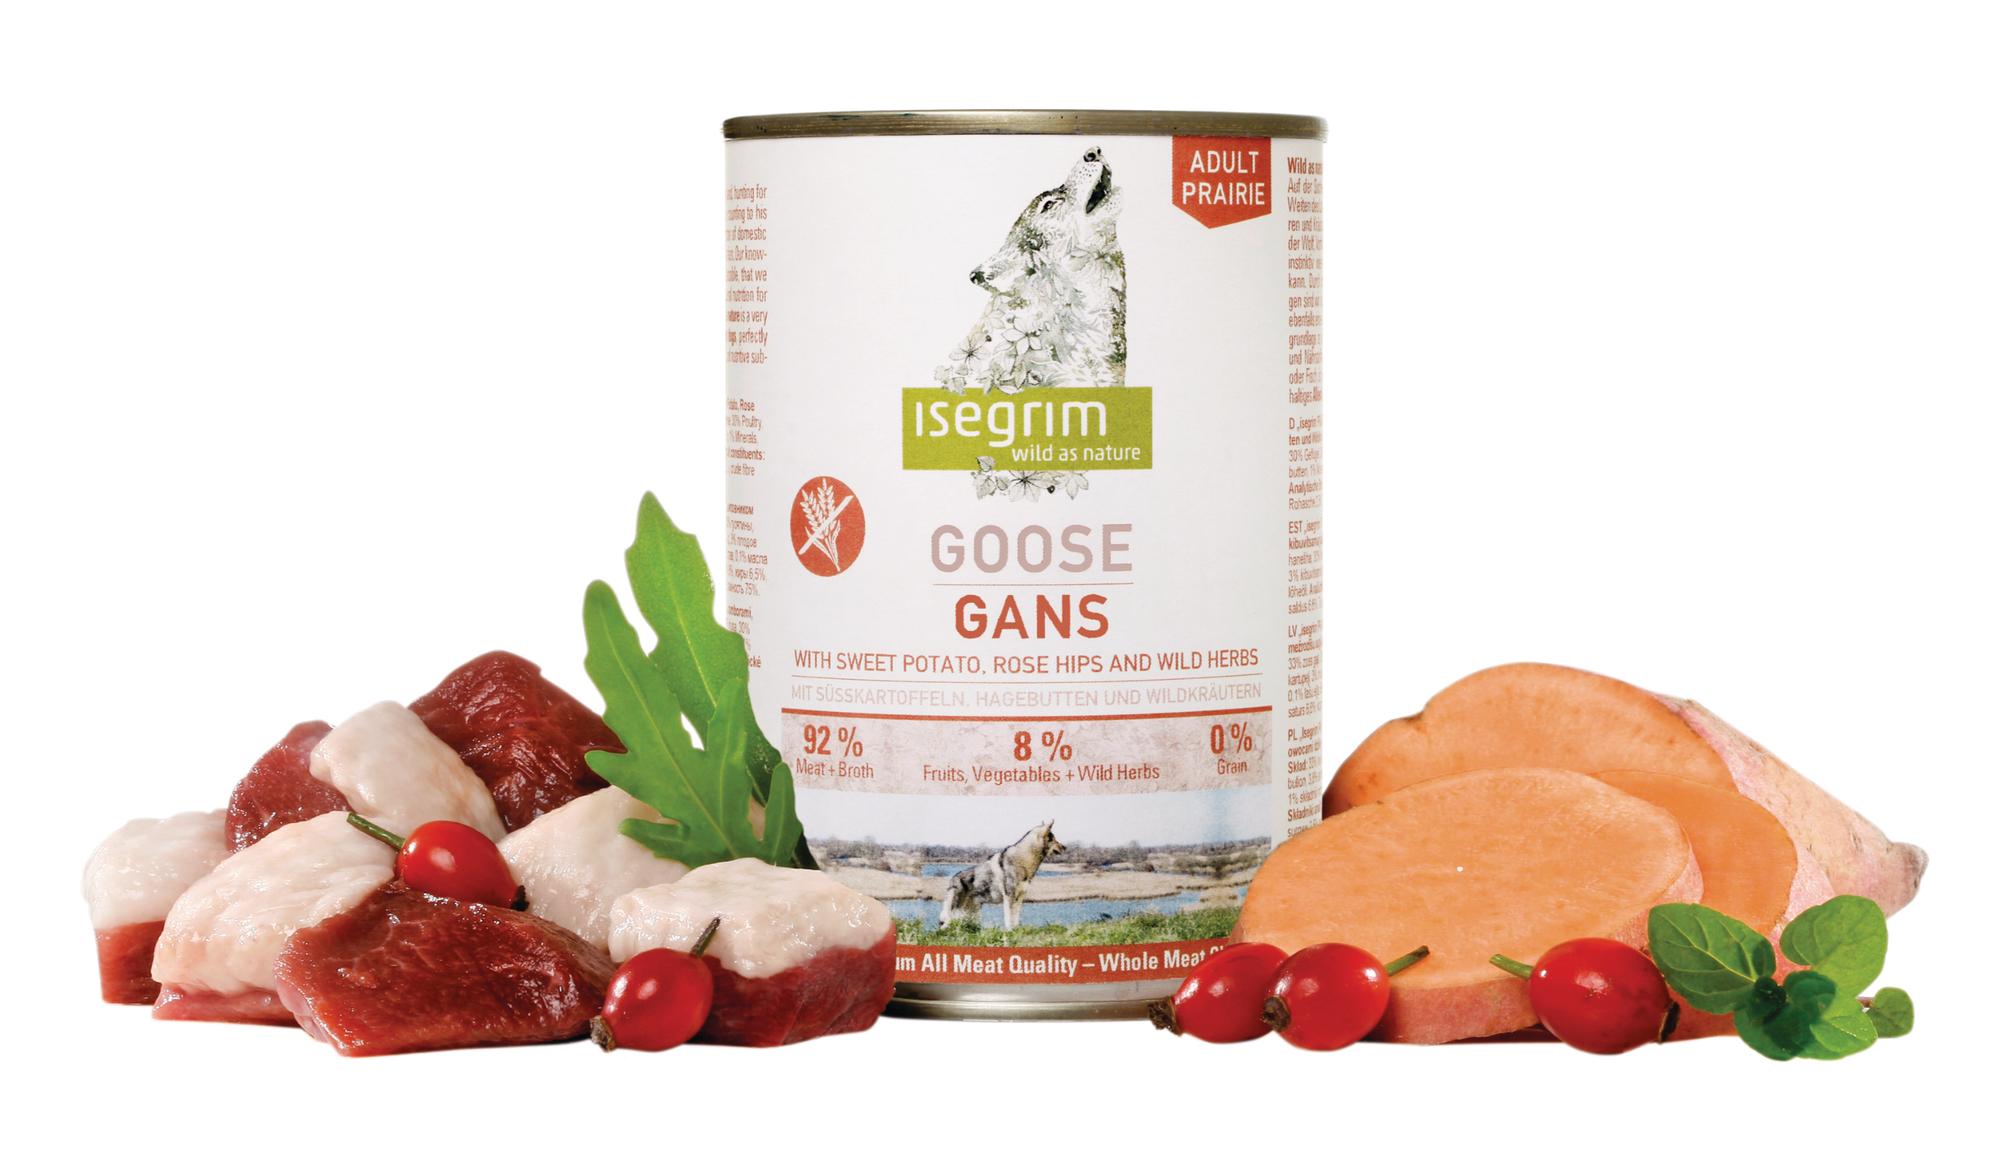 ISEGRIM Adult Prairie: Husa s batáty, šípkem a bylinkami 800g